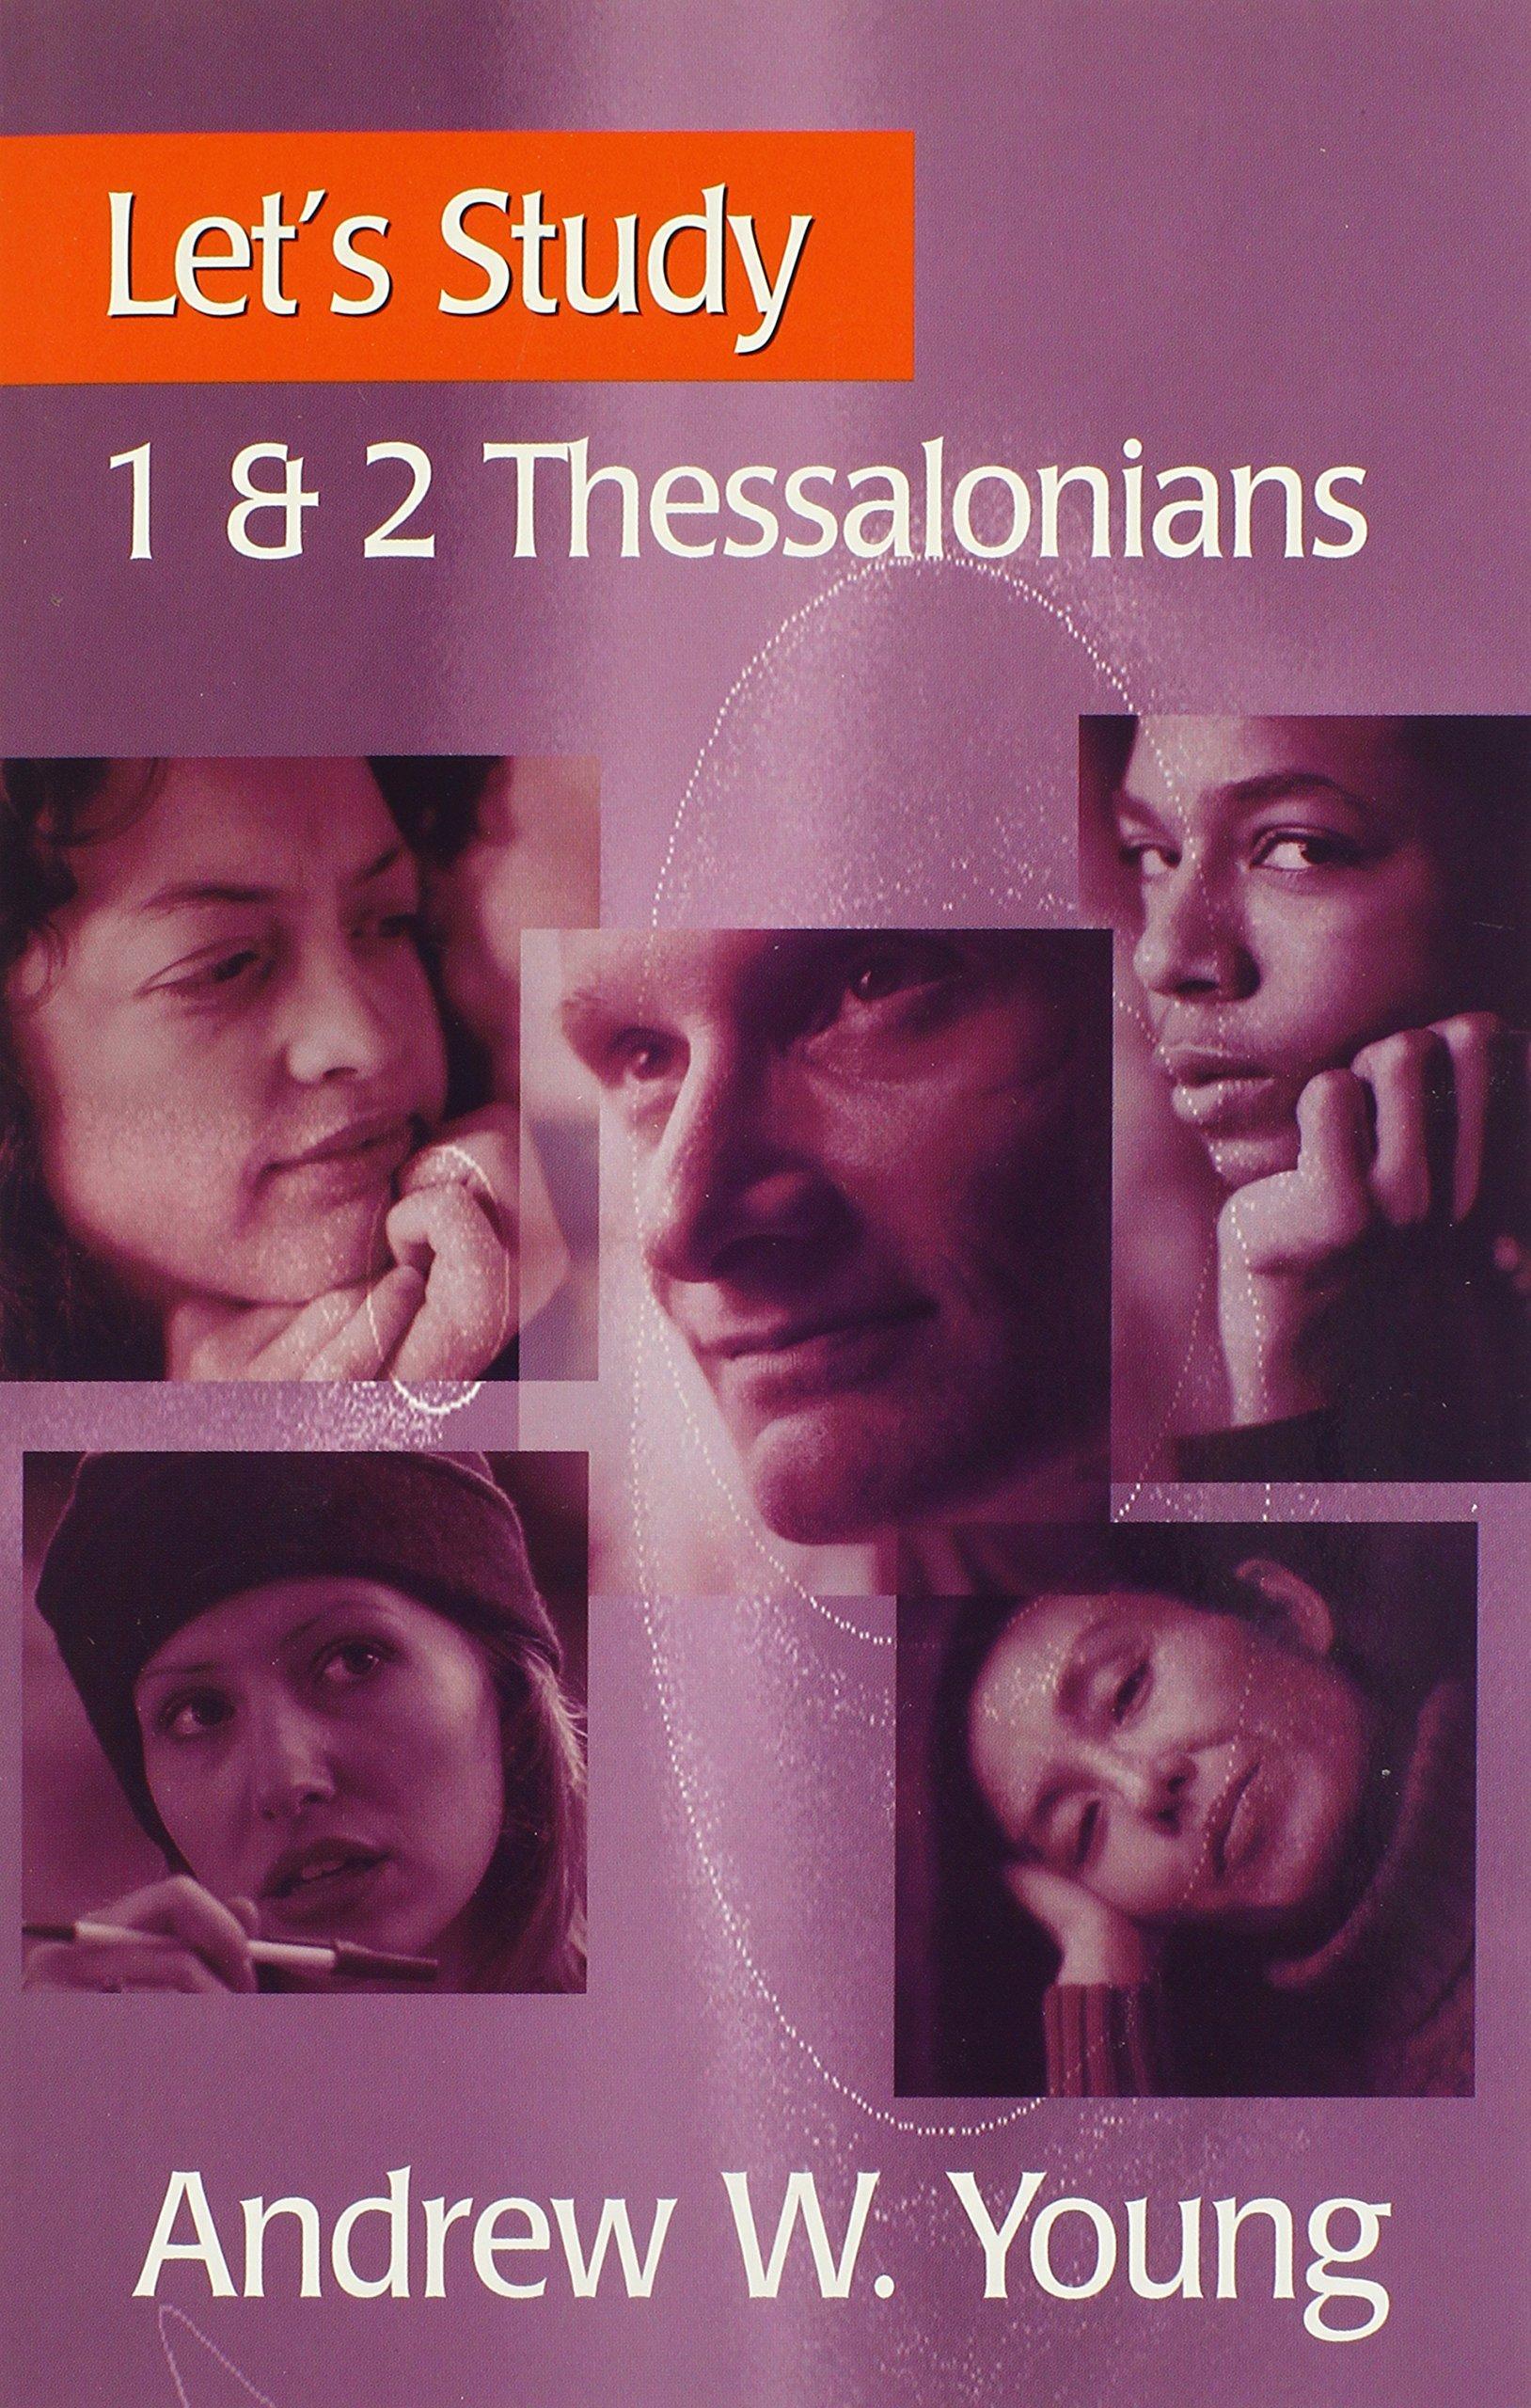 Download Let's Study 1 & 2 Thessalonians PDF